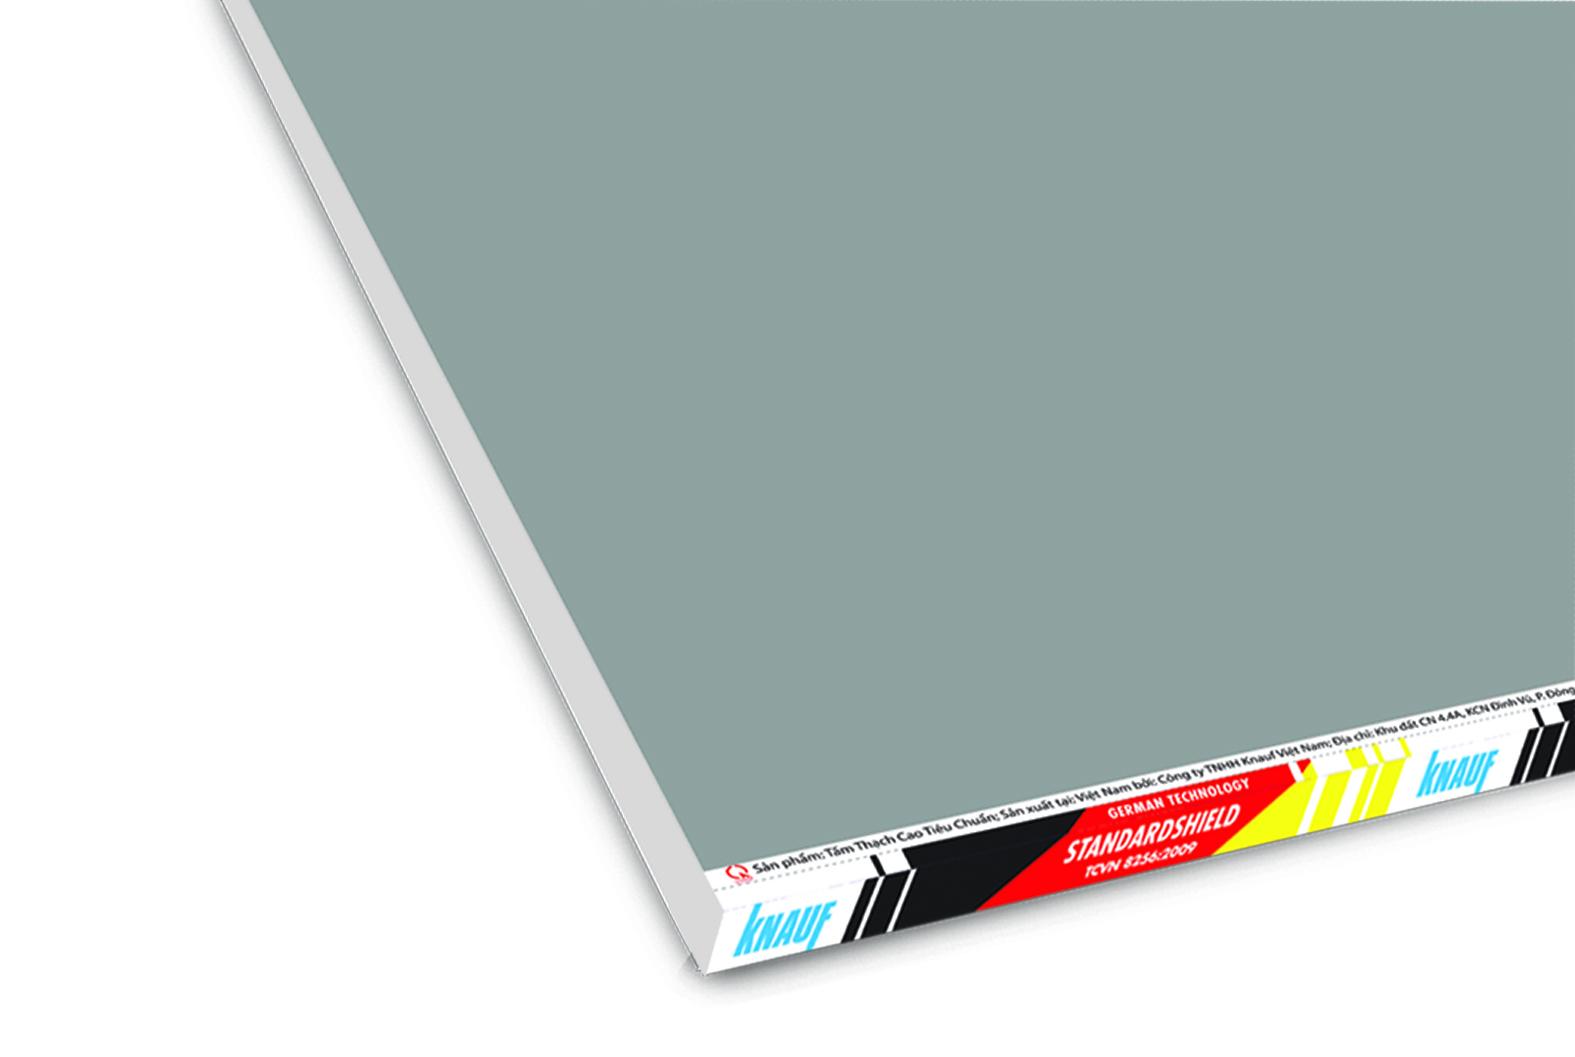 Catalogue-297x210mm- file gốc 24-11-2018